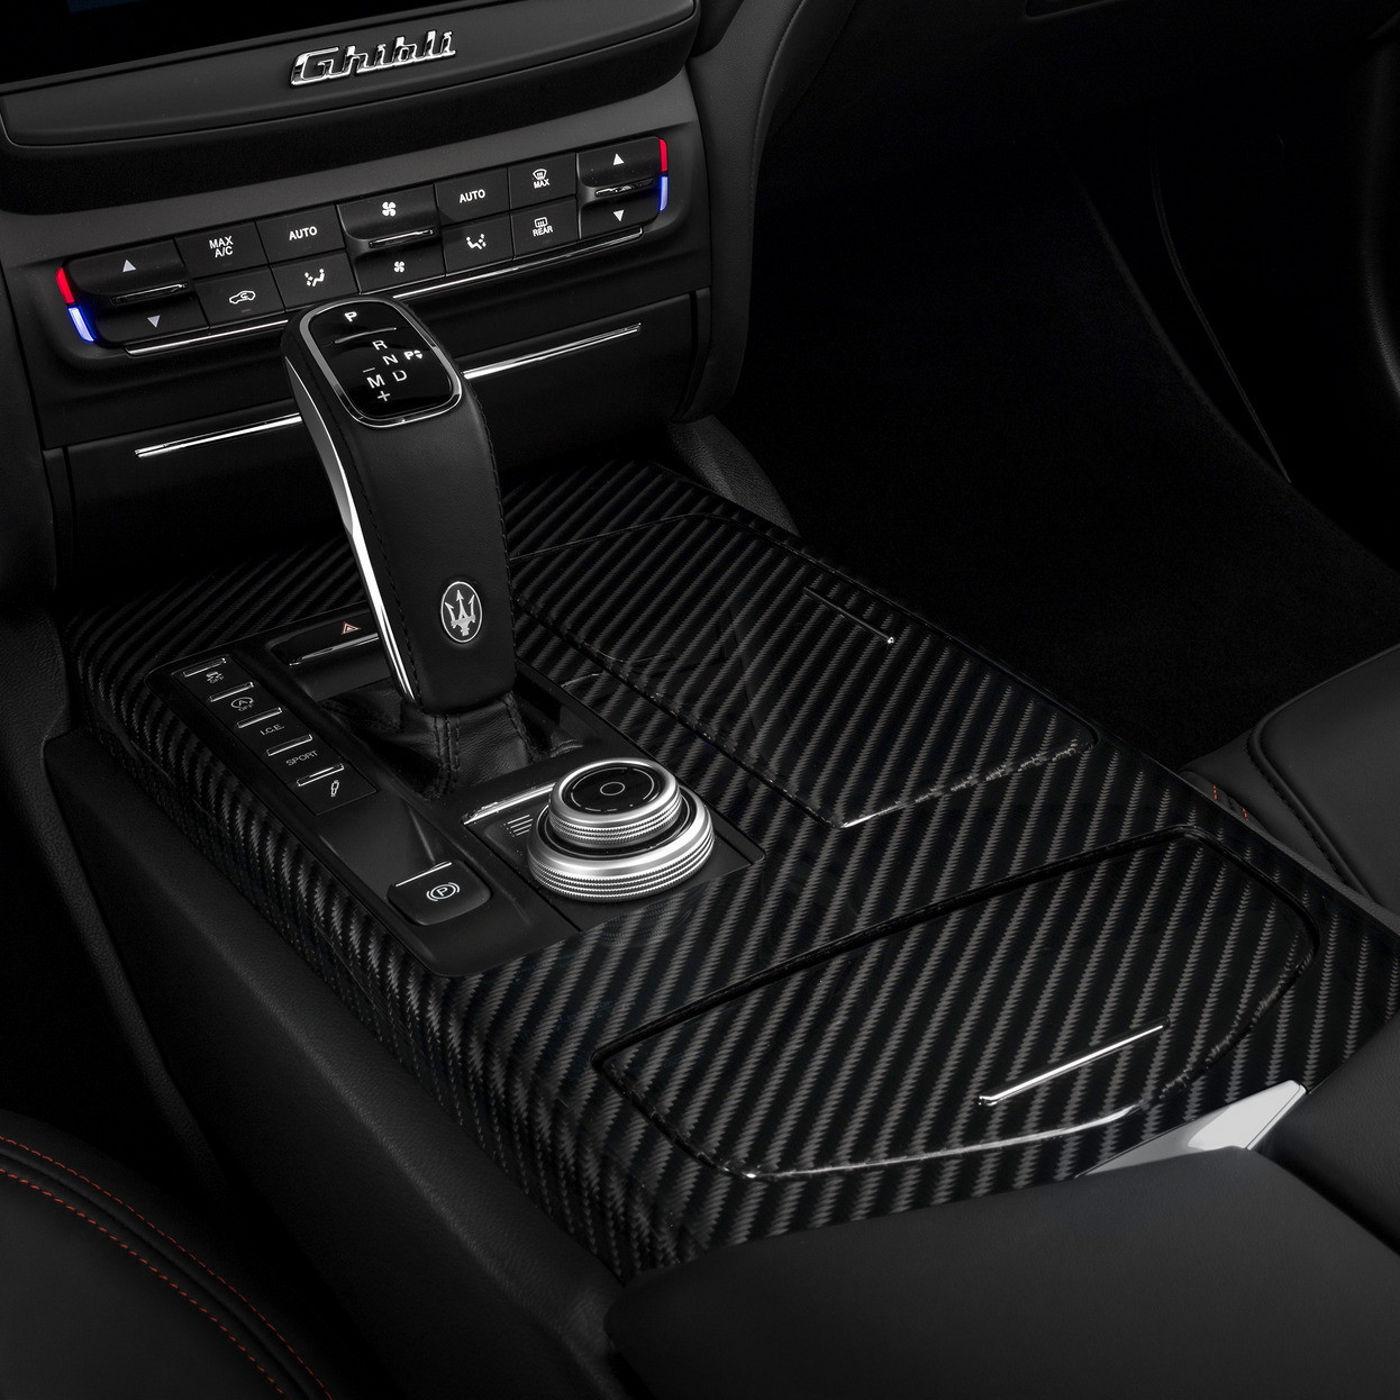 Maserati Ghibli - eight-speed automatic ZF transmission